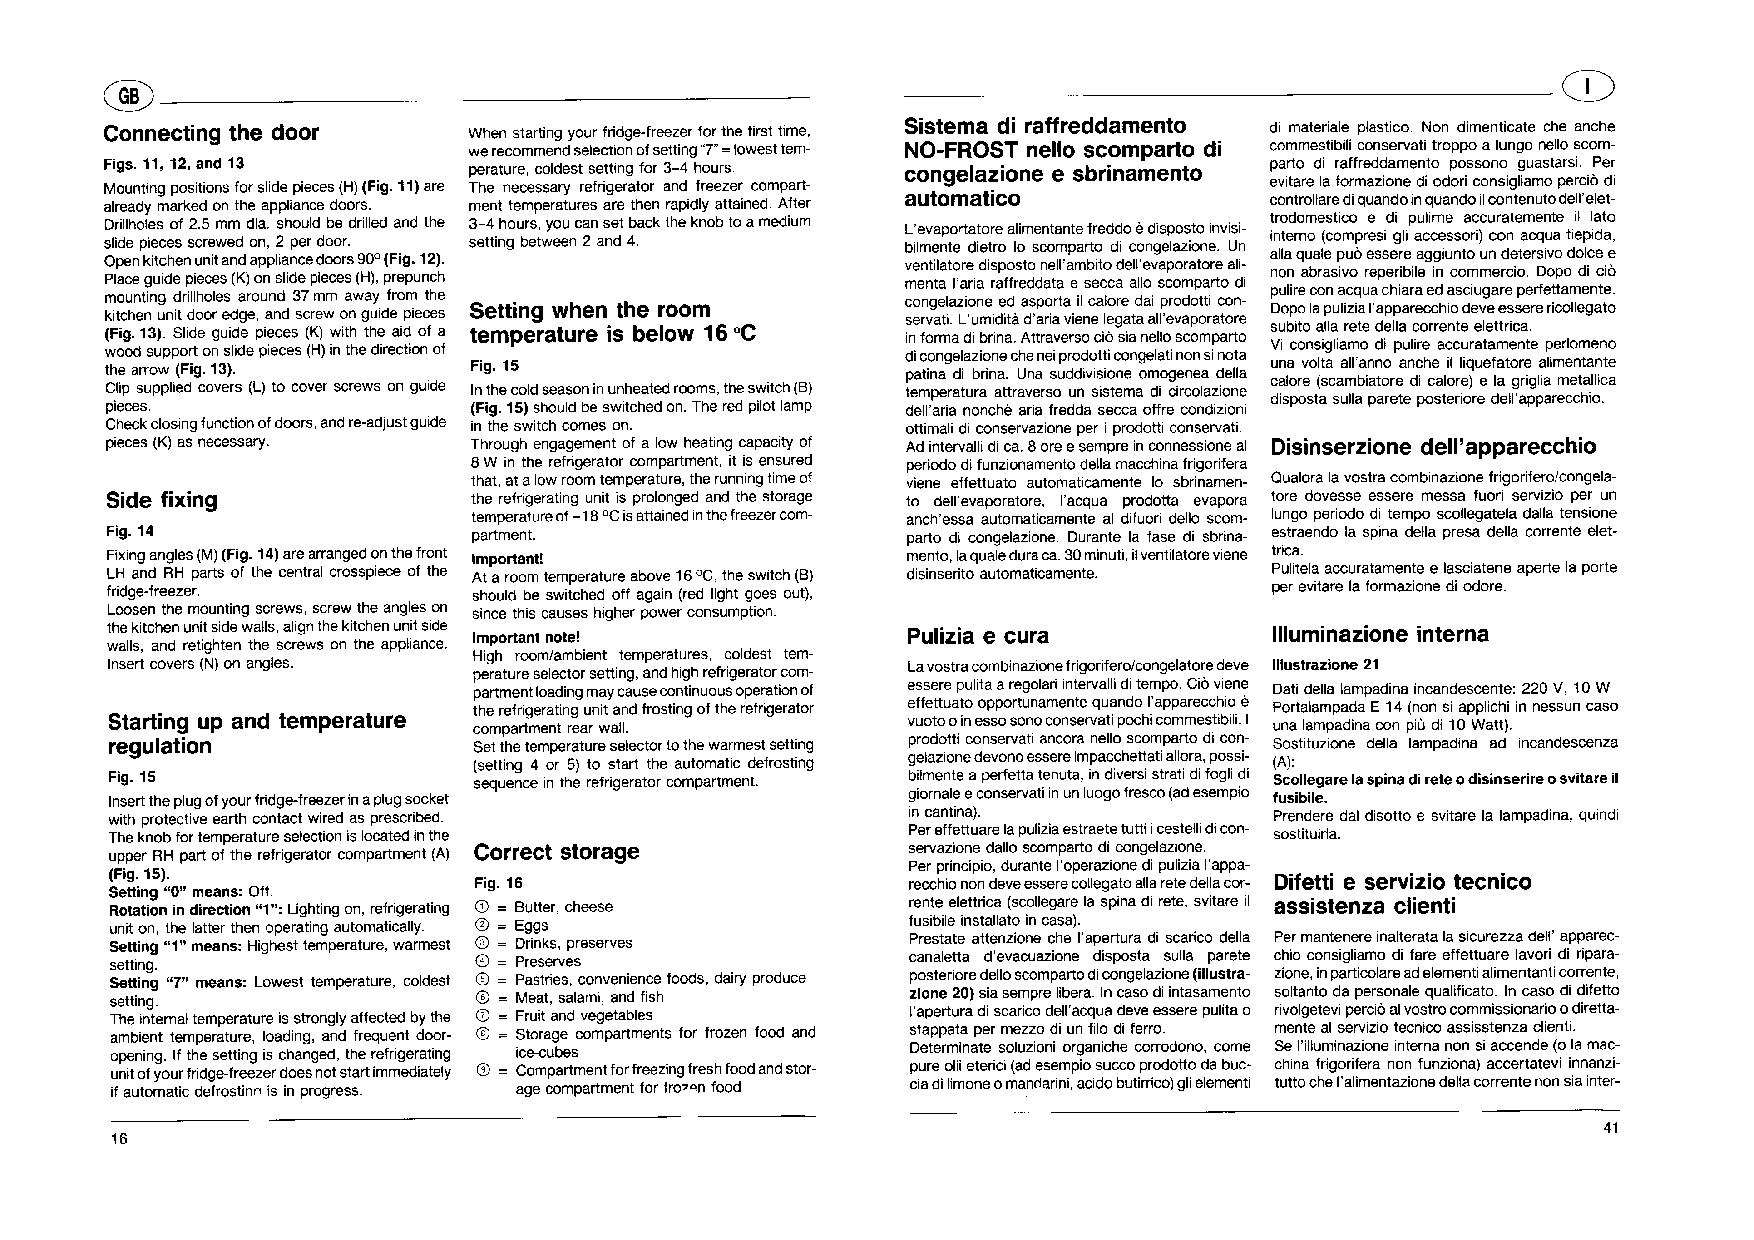 Aeg Assistenza Clienti.Aeg Electrolux S 3049 I No Frost User Manual